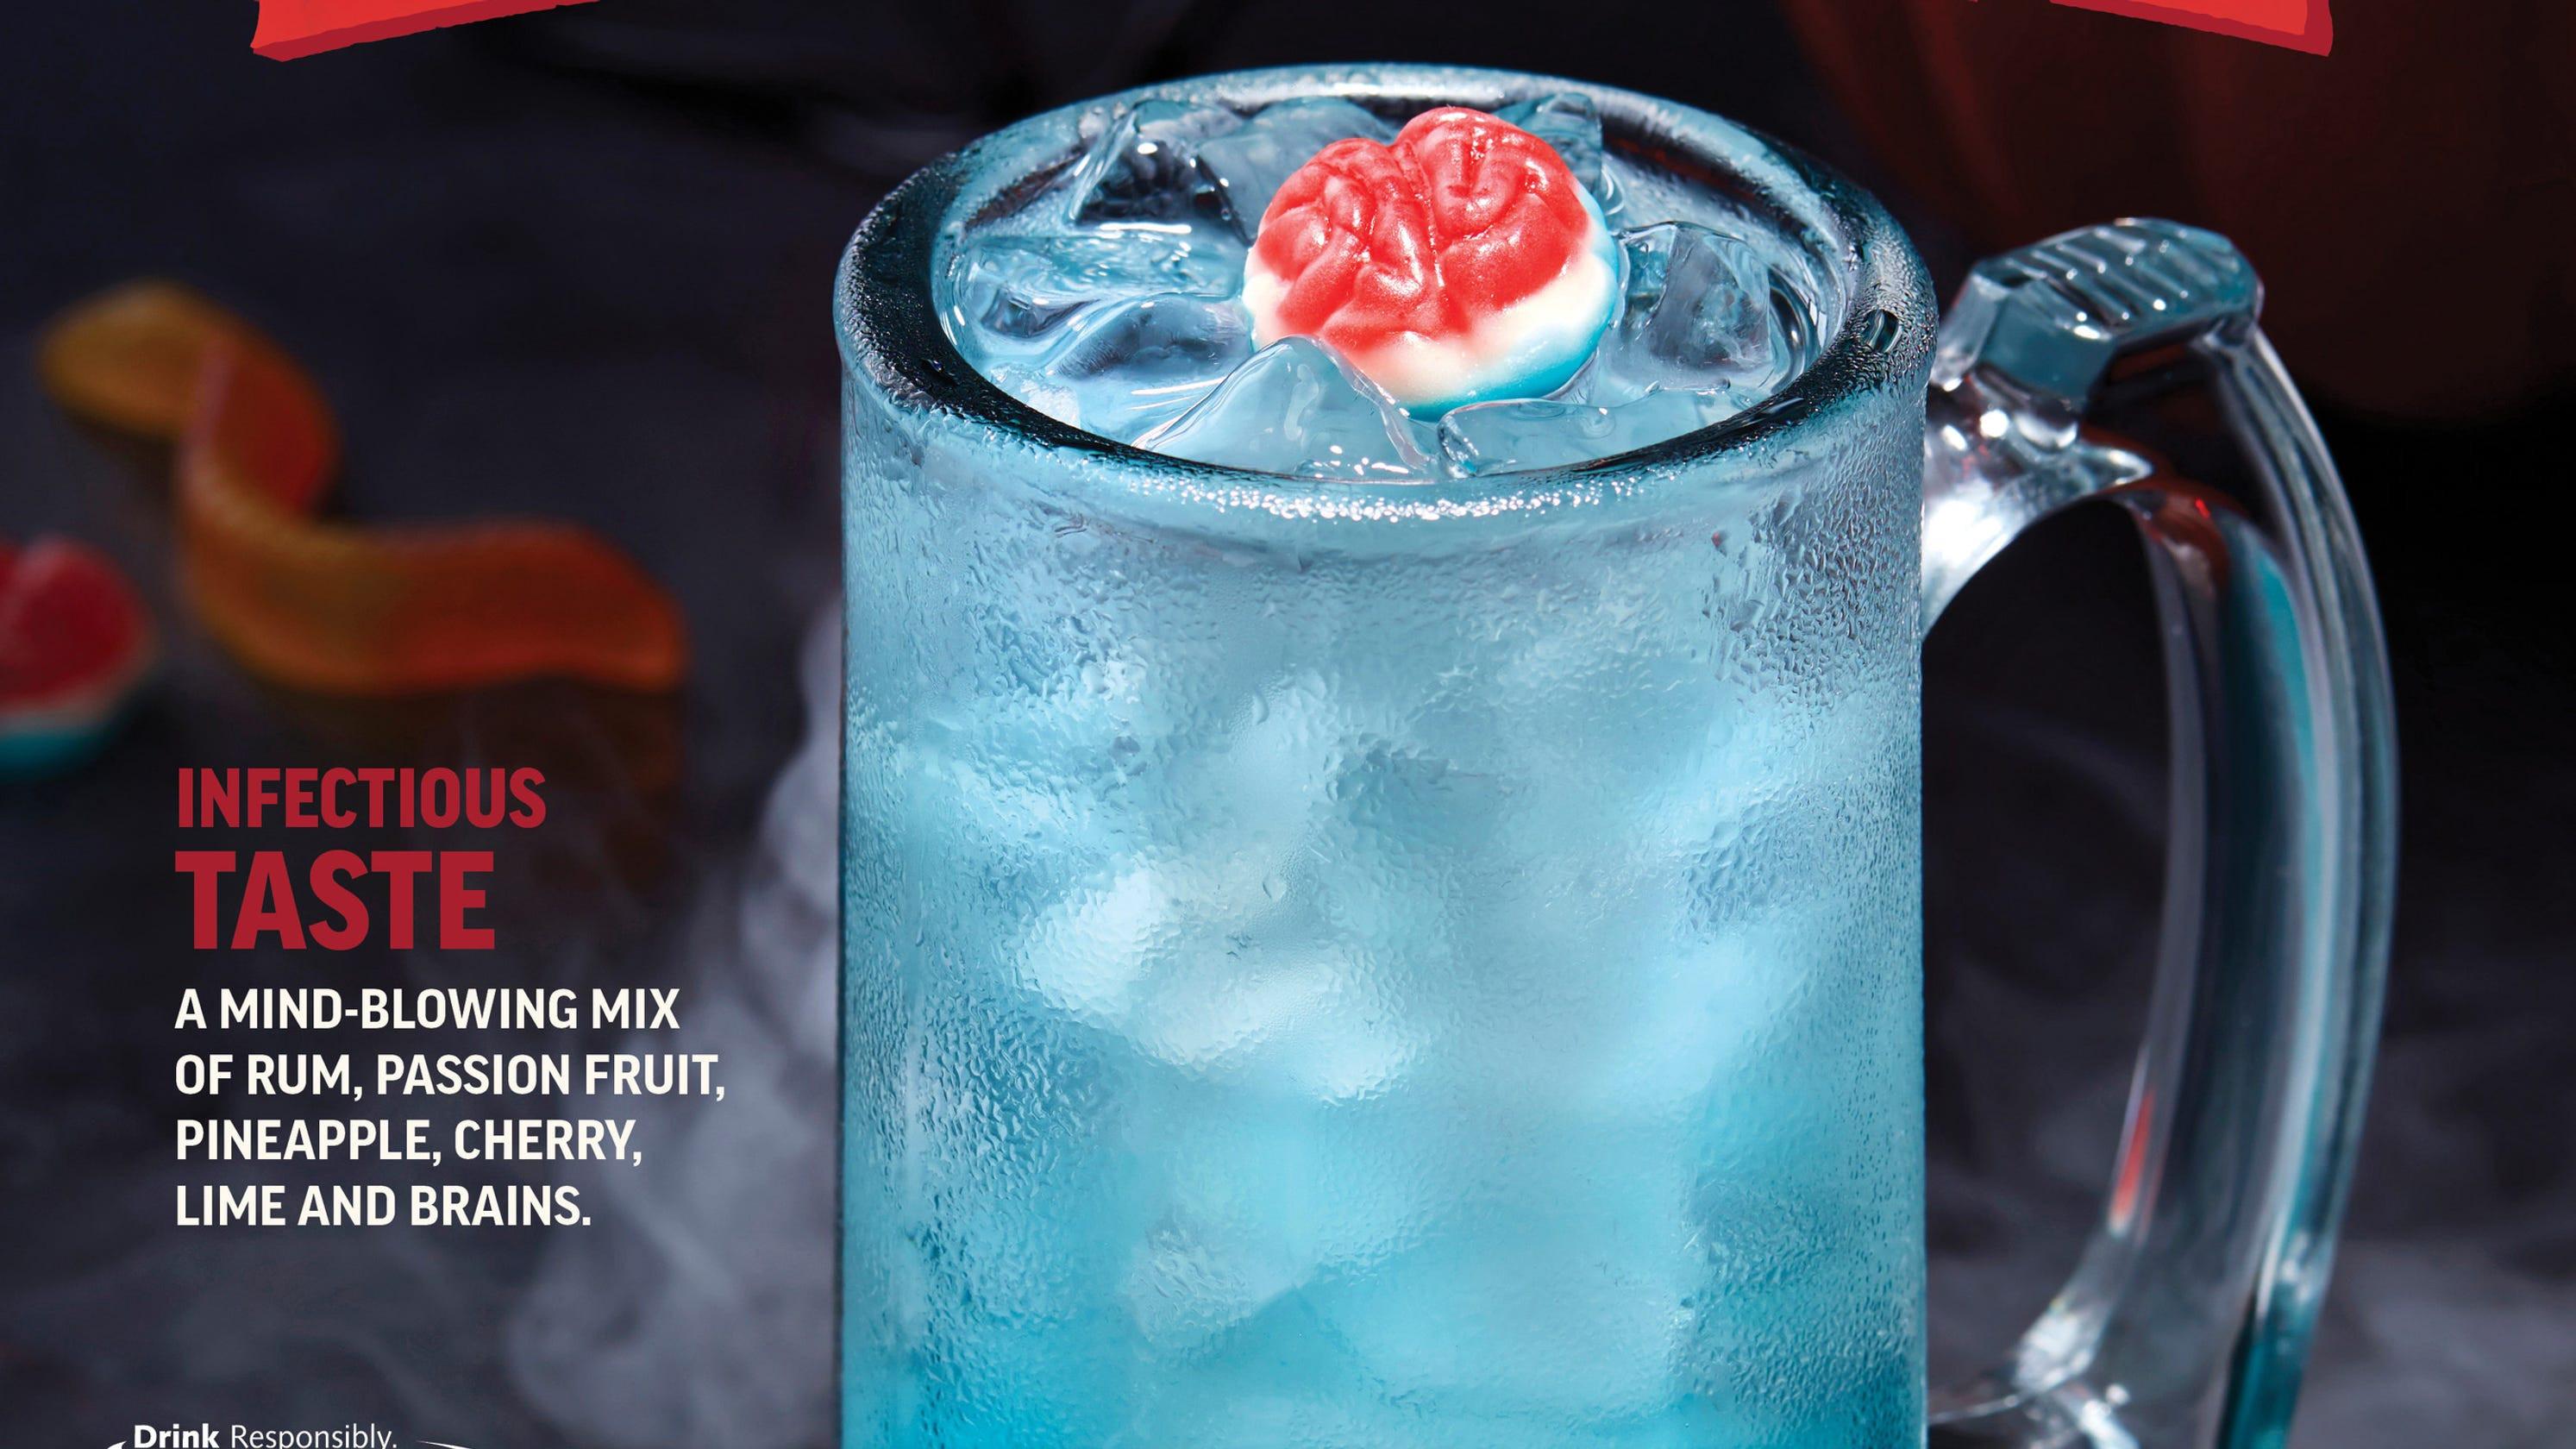 Applebees Halloween Drinks  Applebee s Dollar Zombie drink is a Halloween treat with a